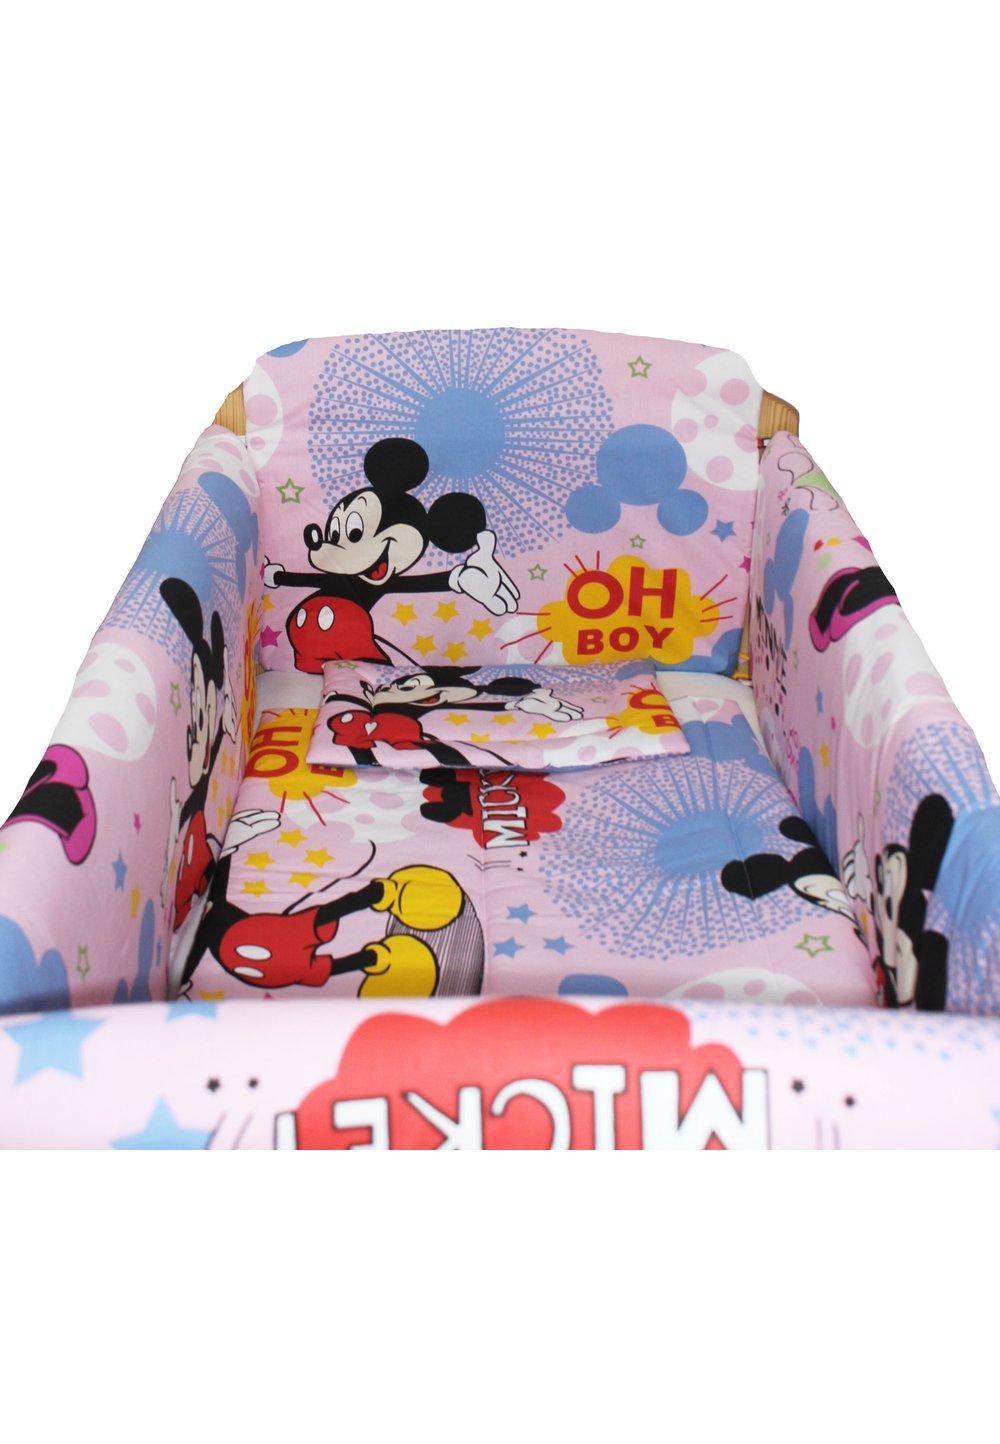 Lenjerie patut 7 piese, Maxi, Minnie si Mickey, roz, 120x60cm imagine